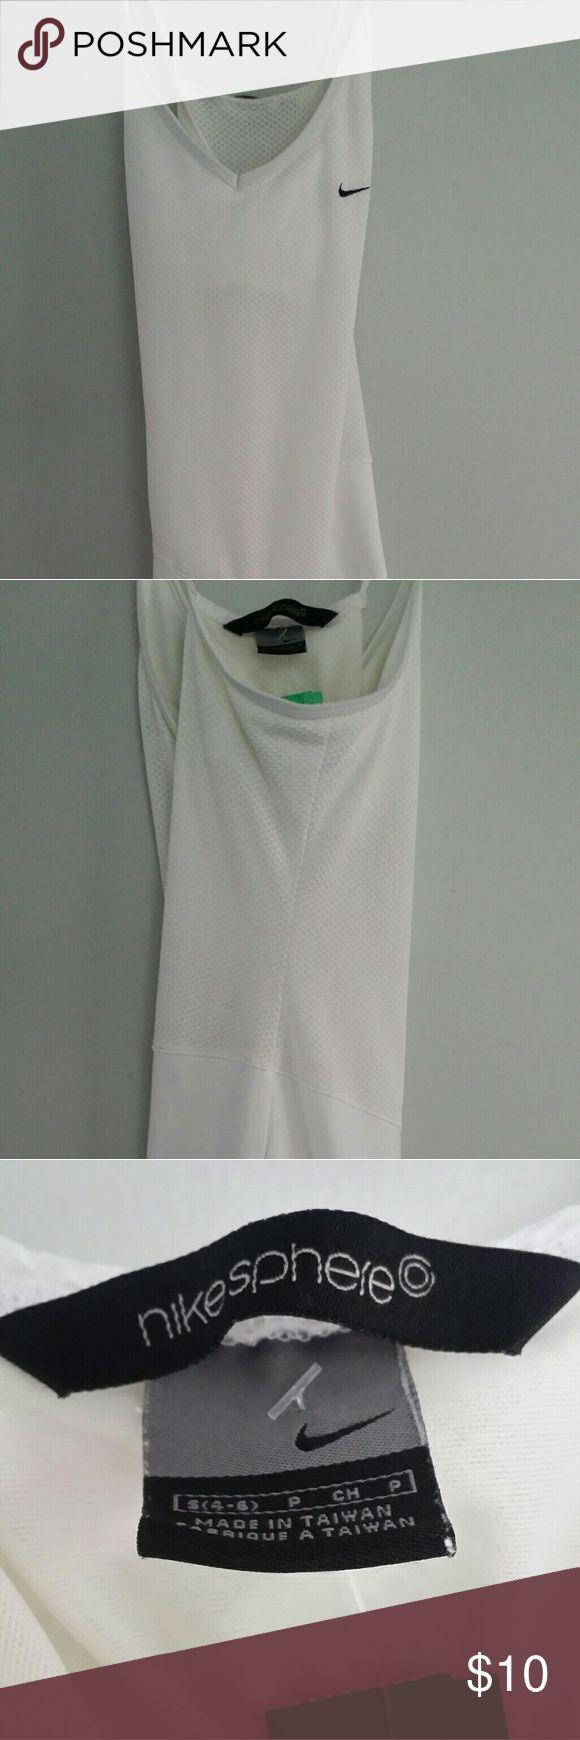 Nike Sphere Dress Size 4 White Nike Dress! PreOwned great condition Nike Dresses Mini